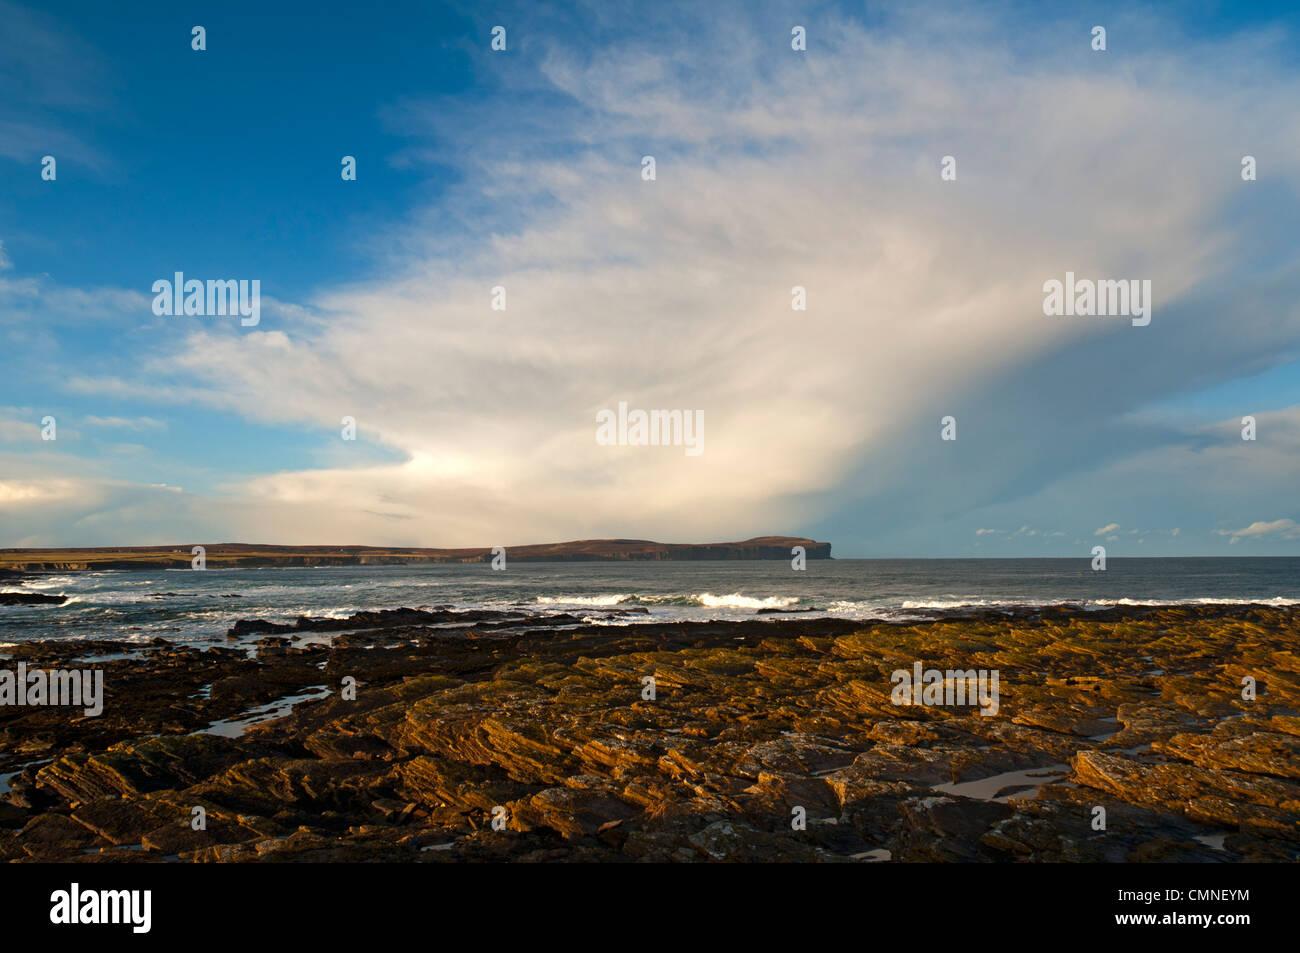 Cumulonimbus shower cloud over Dunnet Head  and the Pentland Firth, Caithness, Scotland, UK. - Stock Image